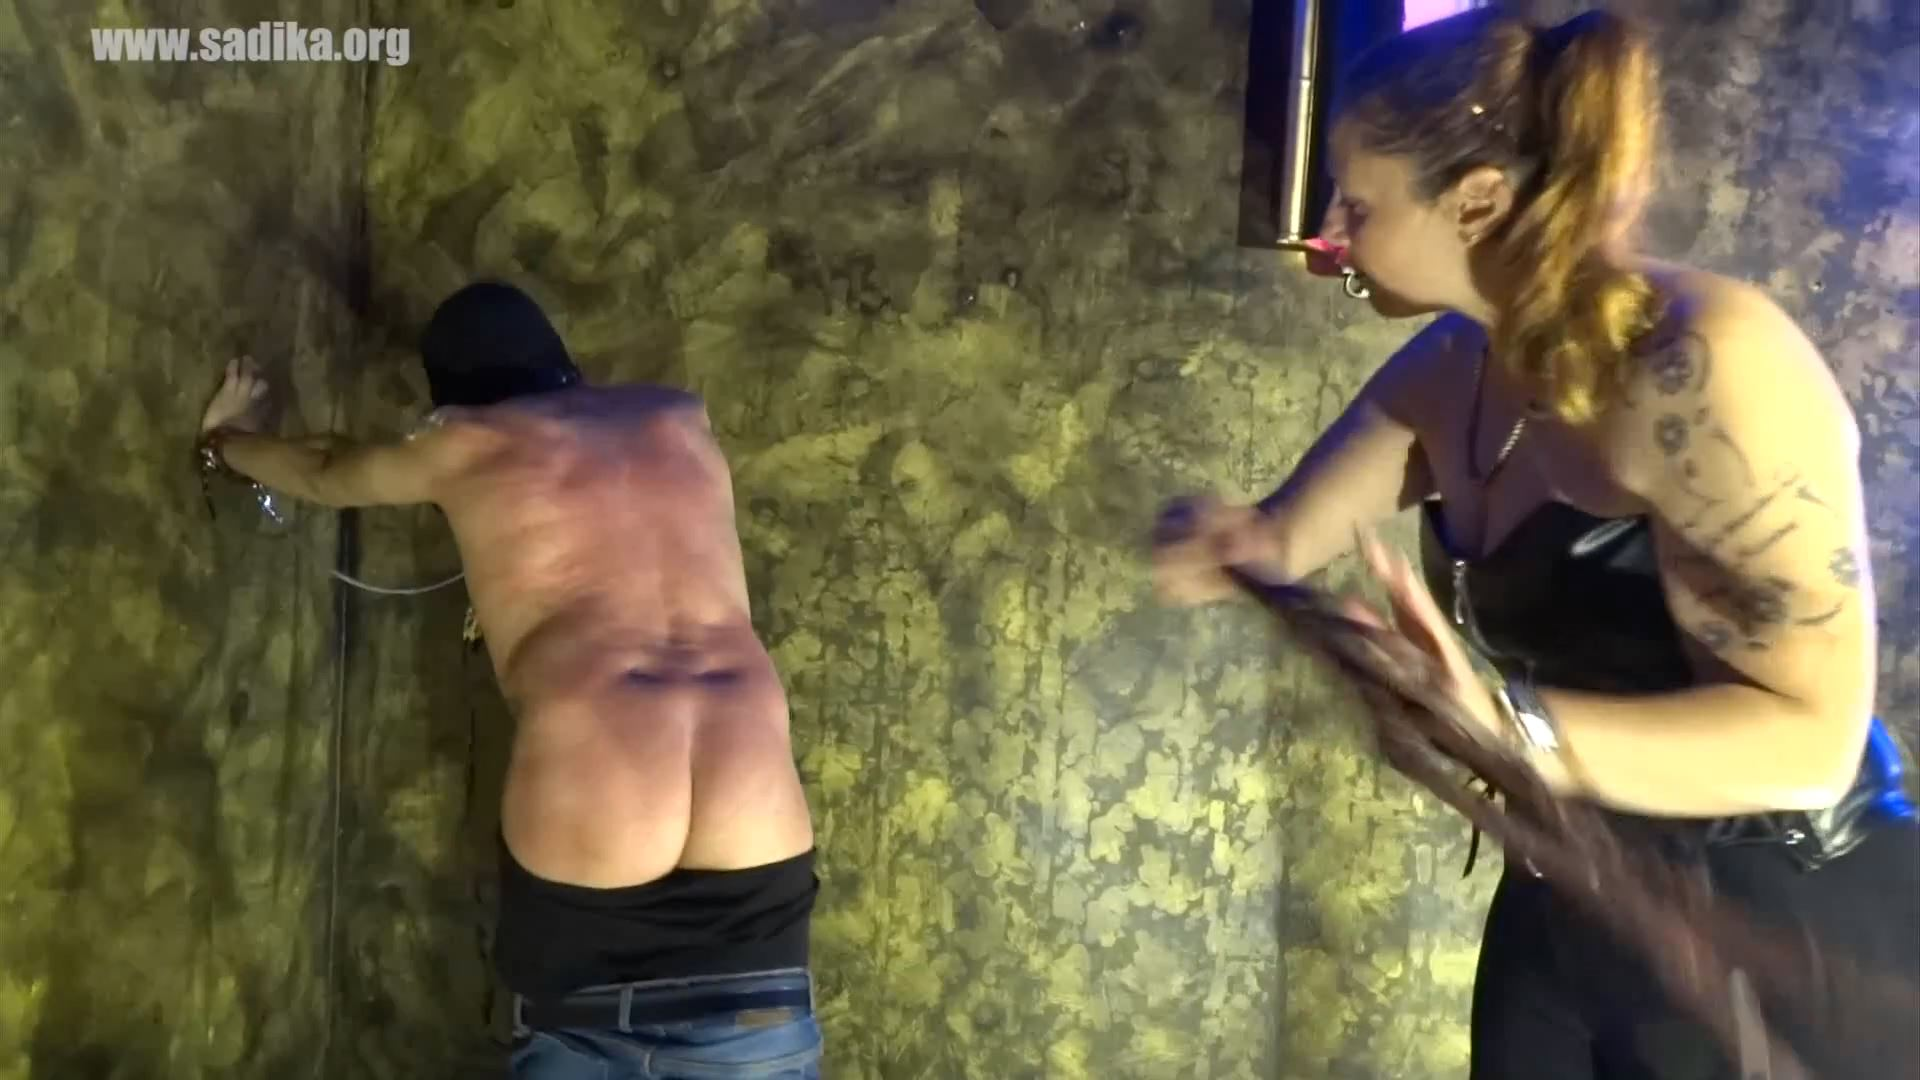 Jennyfer Cruel In Scene: Whipping Slave 2 - WOMEN WEIGHT / SADIKA - FULL HD/1080p/MP4